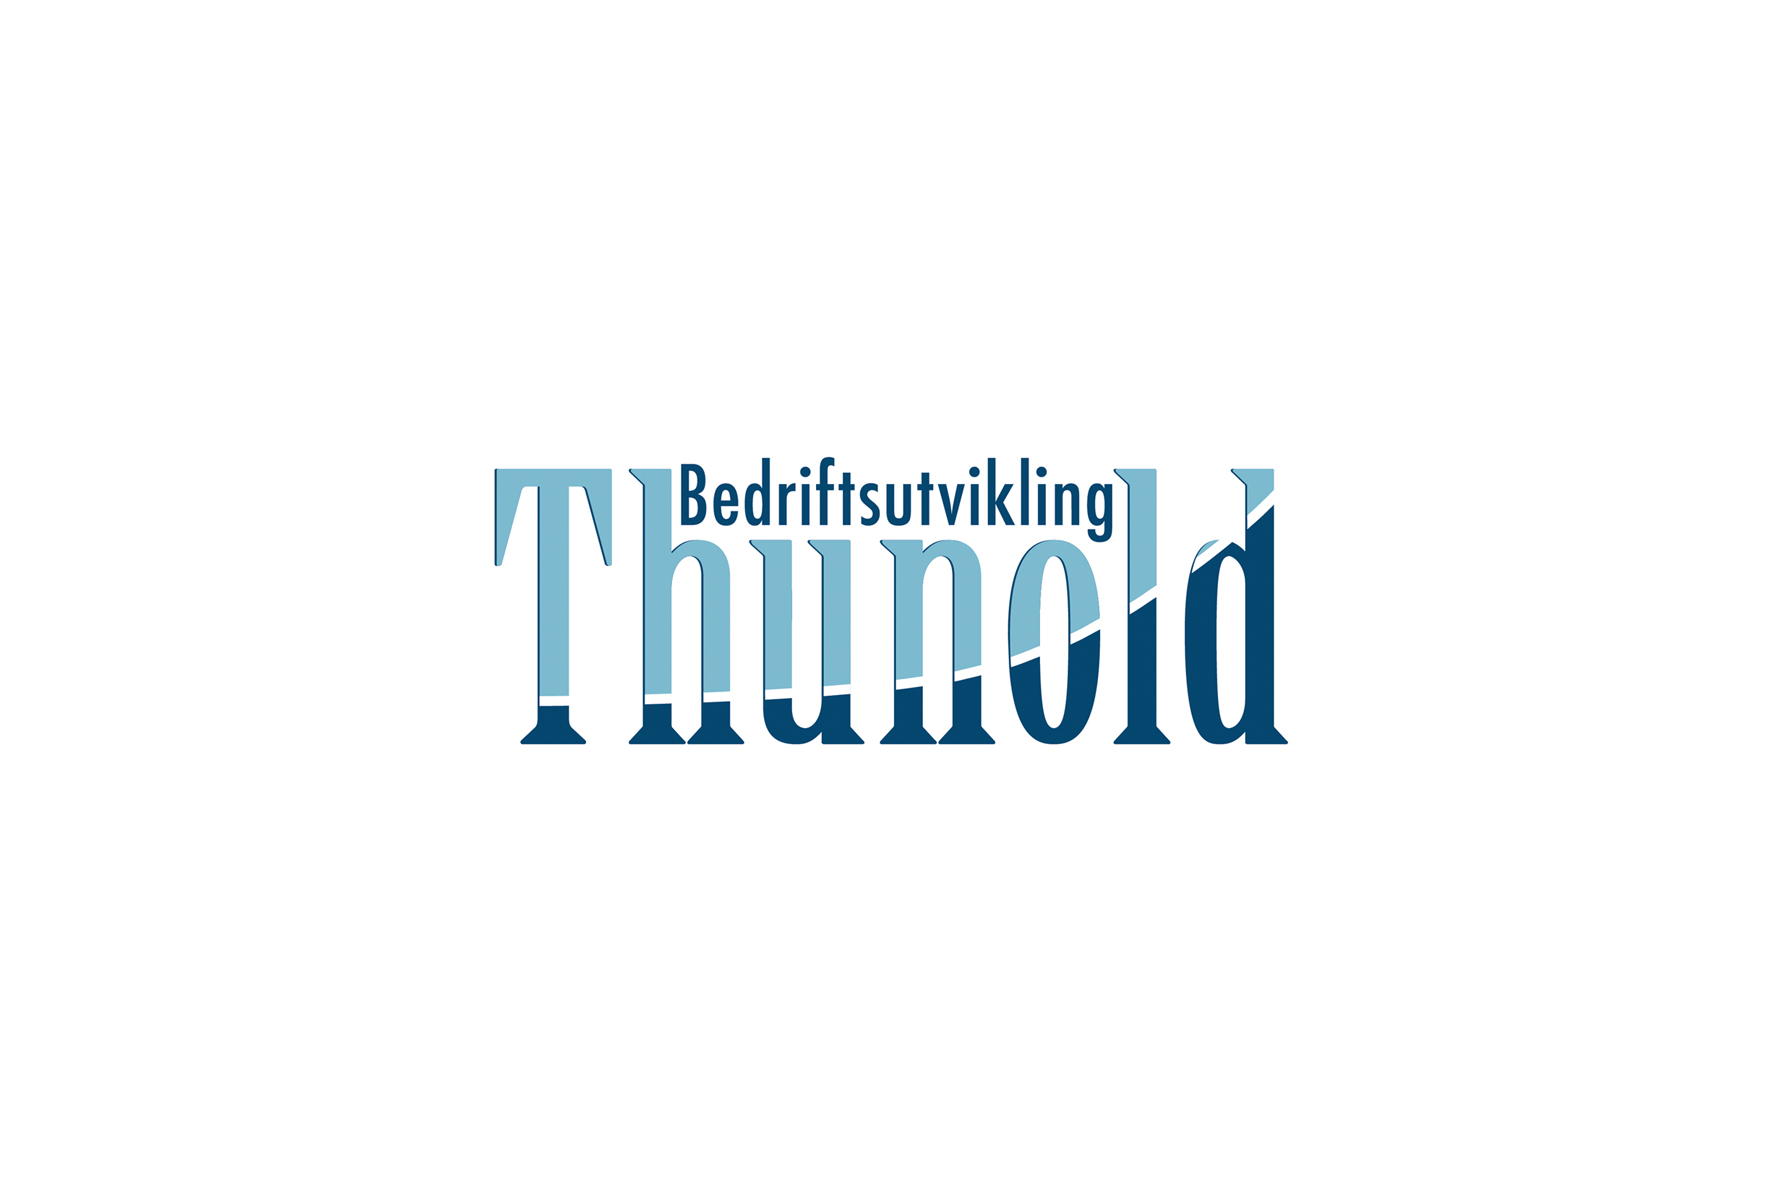 Thunold Bedriftsutvikling